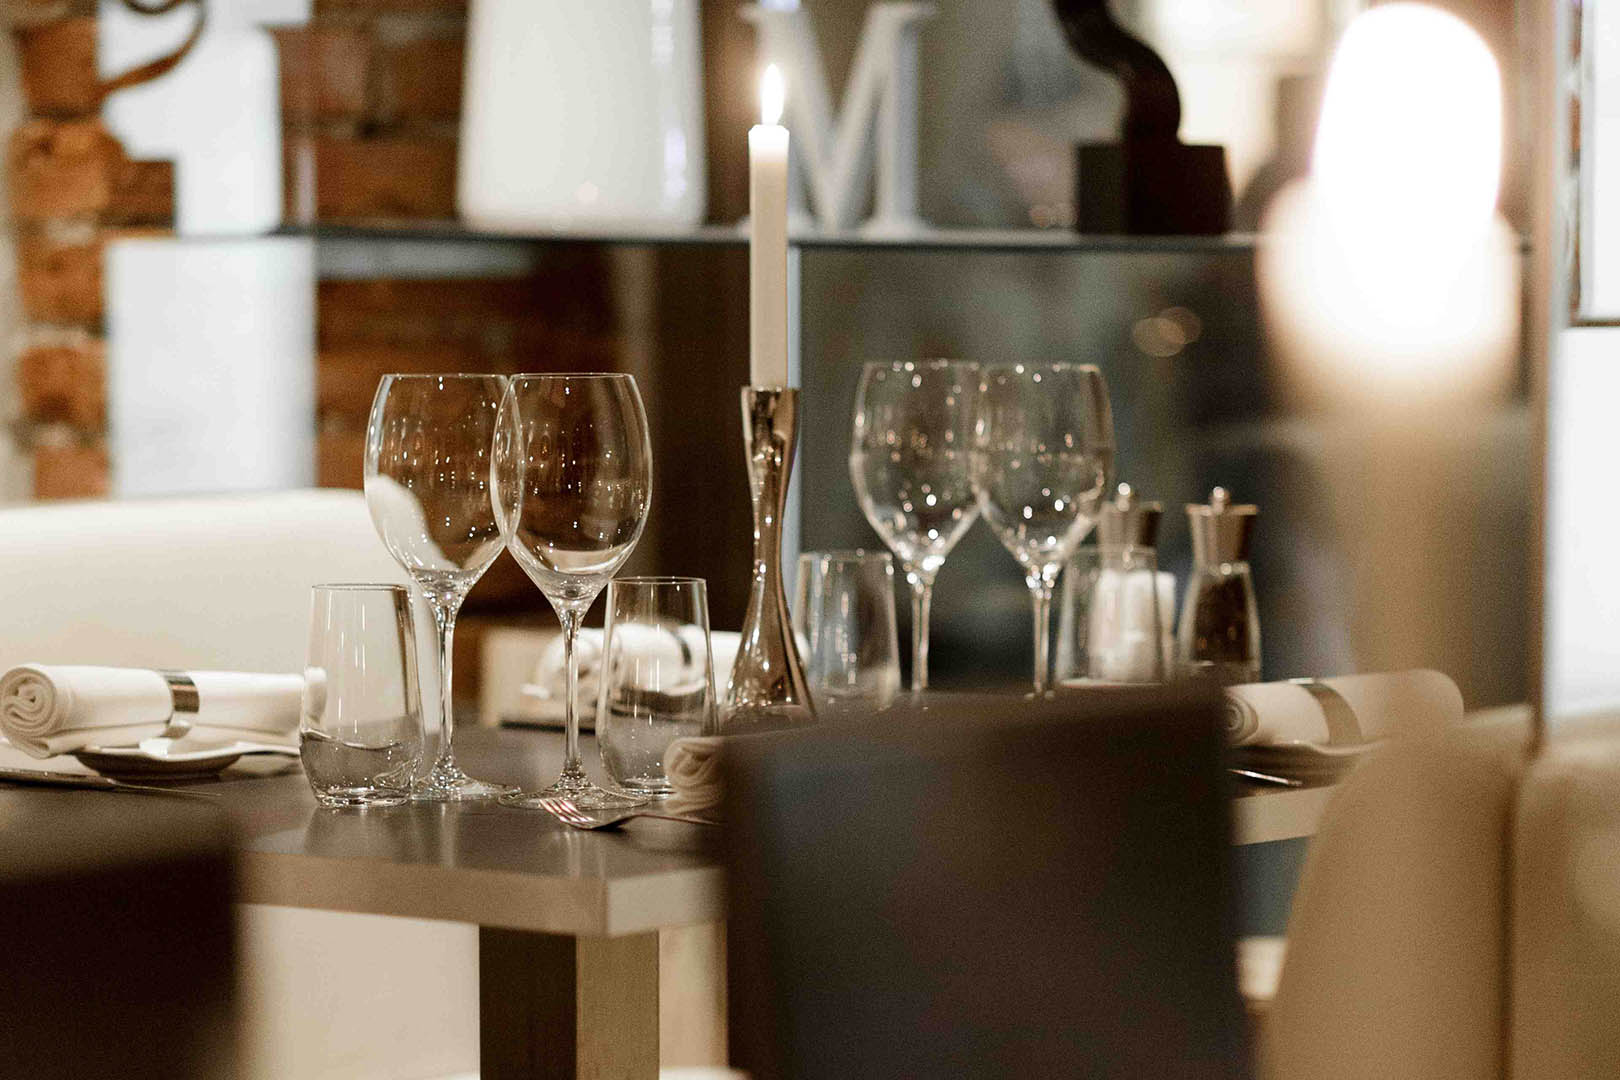 Restaurant Mancini, La Gastronomia Italiana - Scan Magazine, August 2019